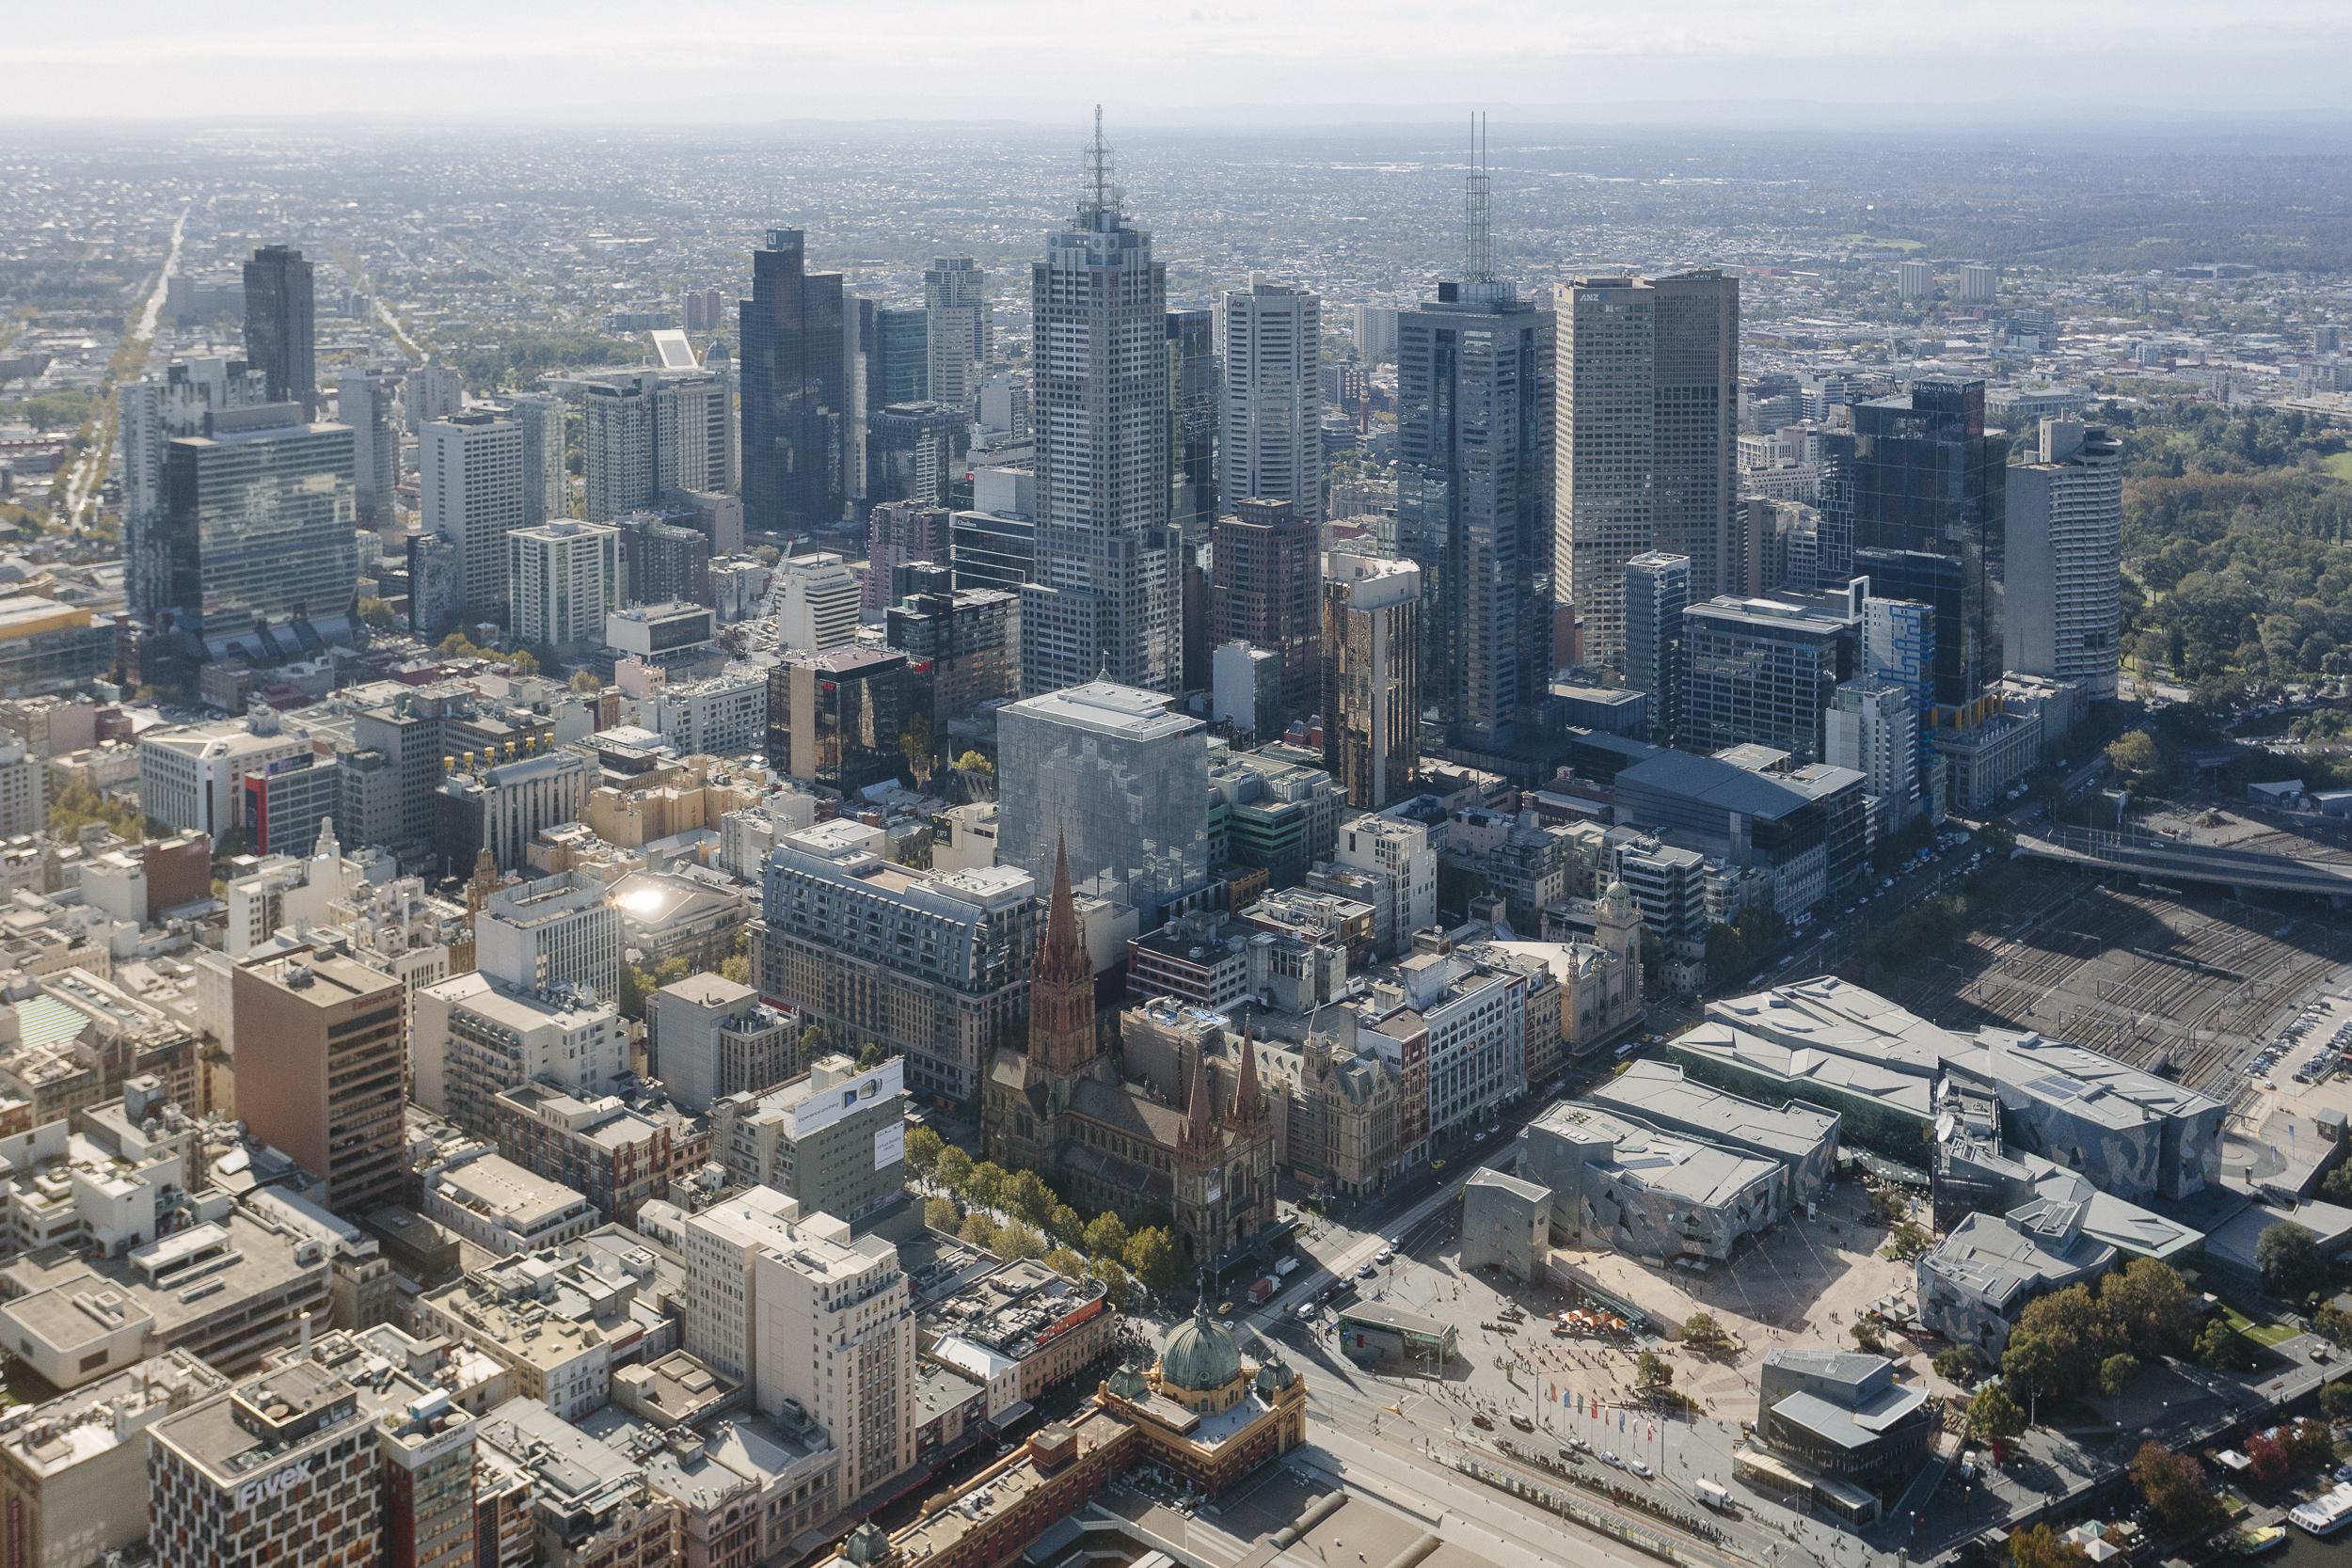 Melbourne_Eureka Tower004.jpg